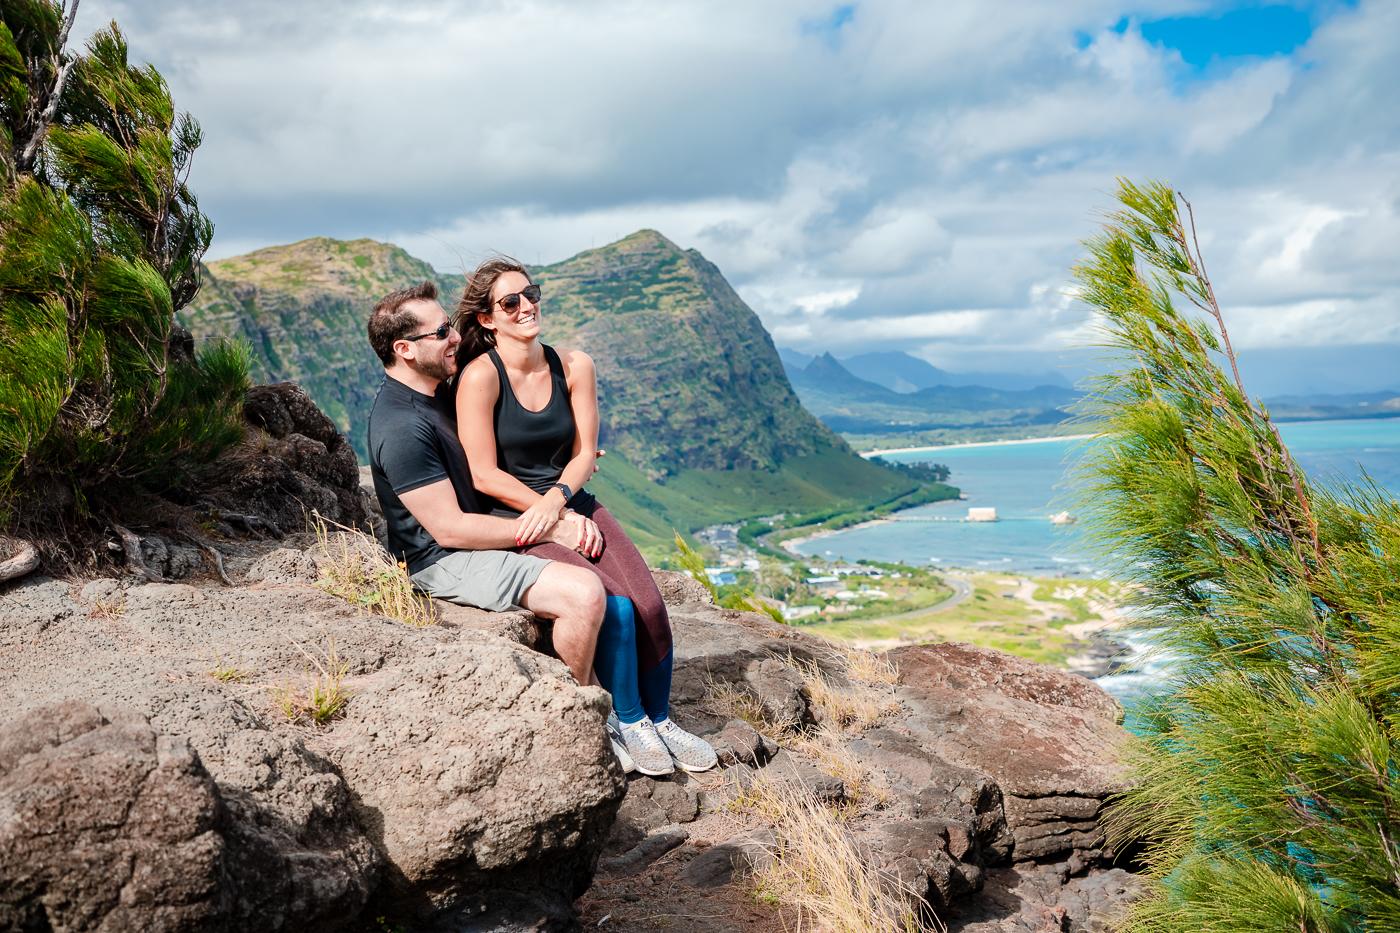 couples proposal photo shoot oahu hawaii ridge trail